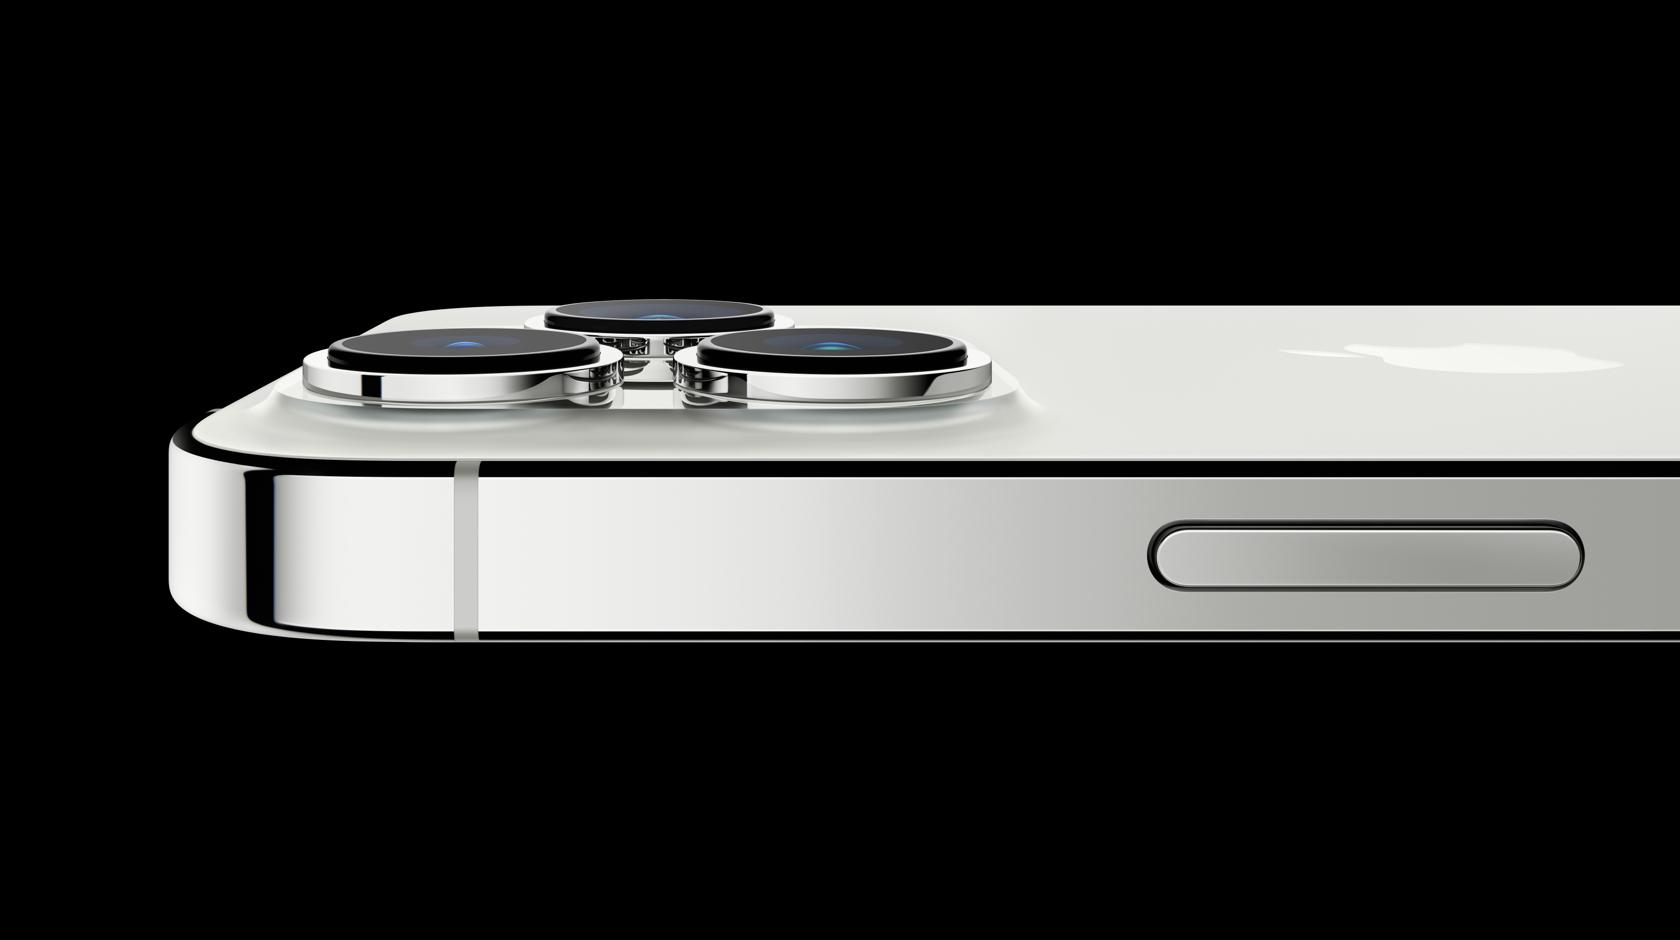 Vista lateral horizontal del iPhone 13